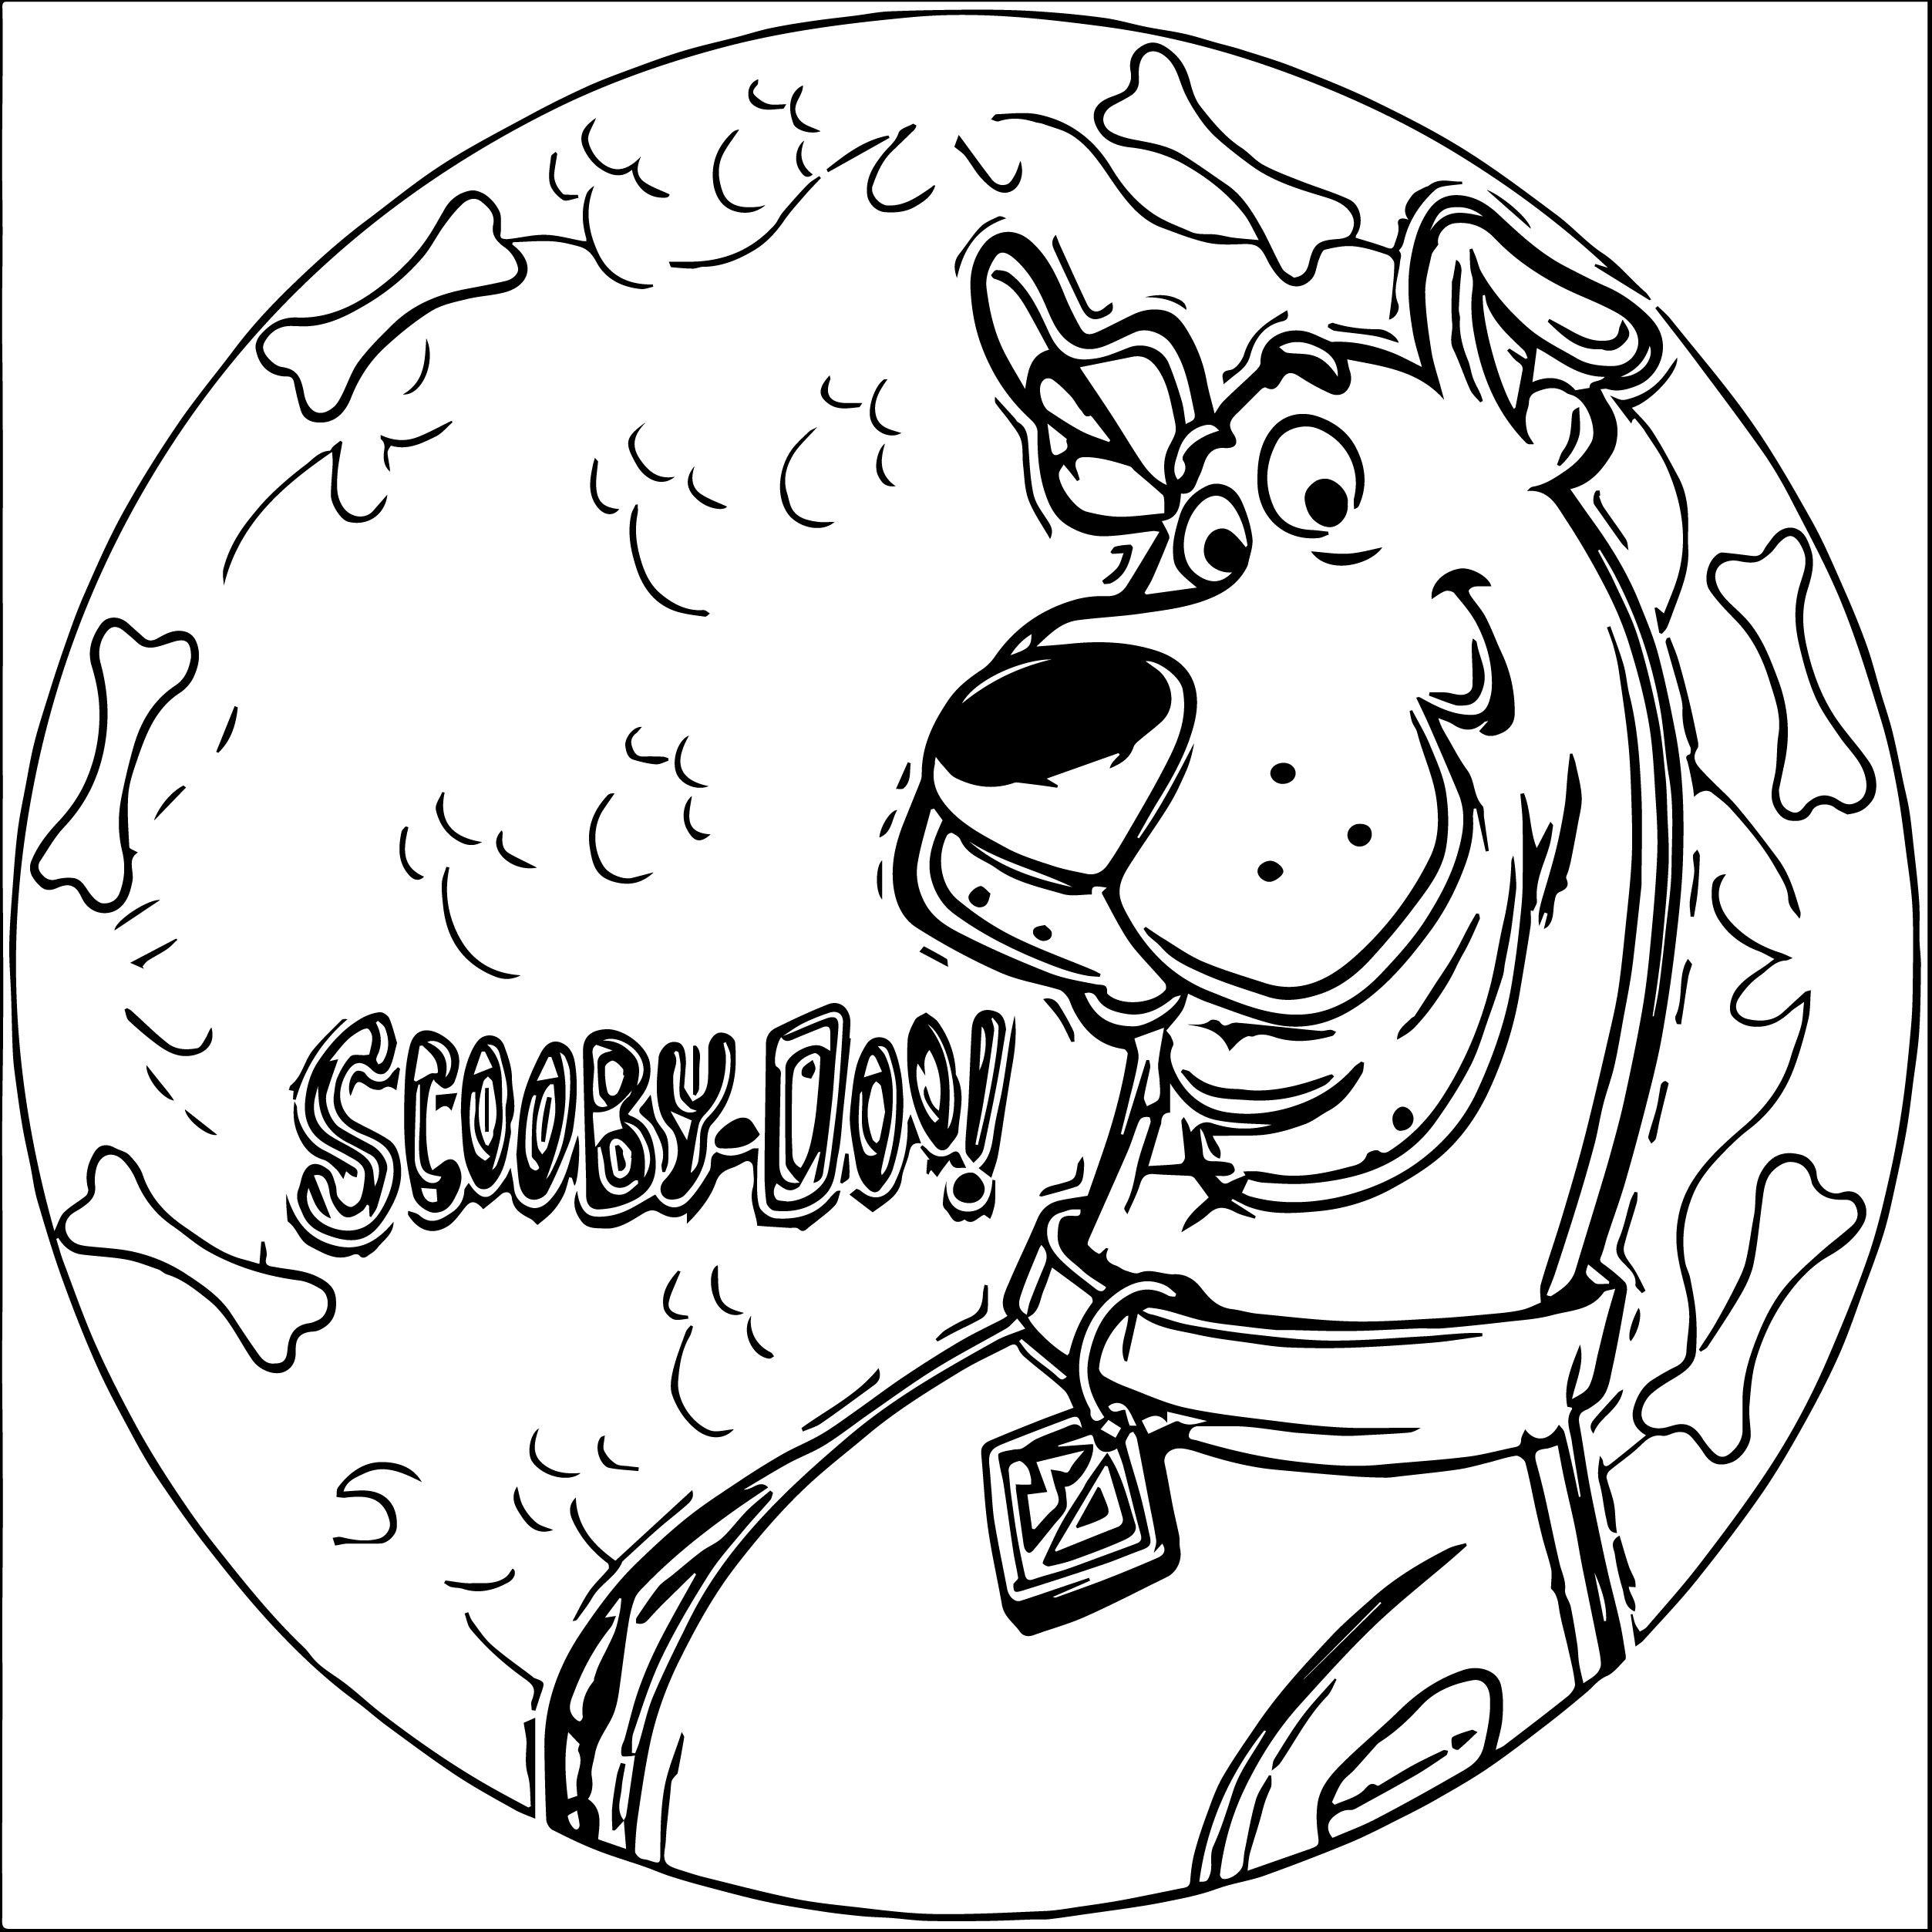 Scooby Doo Coloring Pages Scooby Doo Coloring Pages Valentine